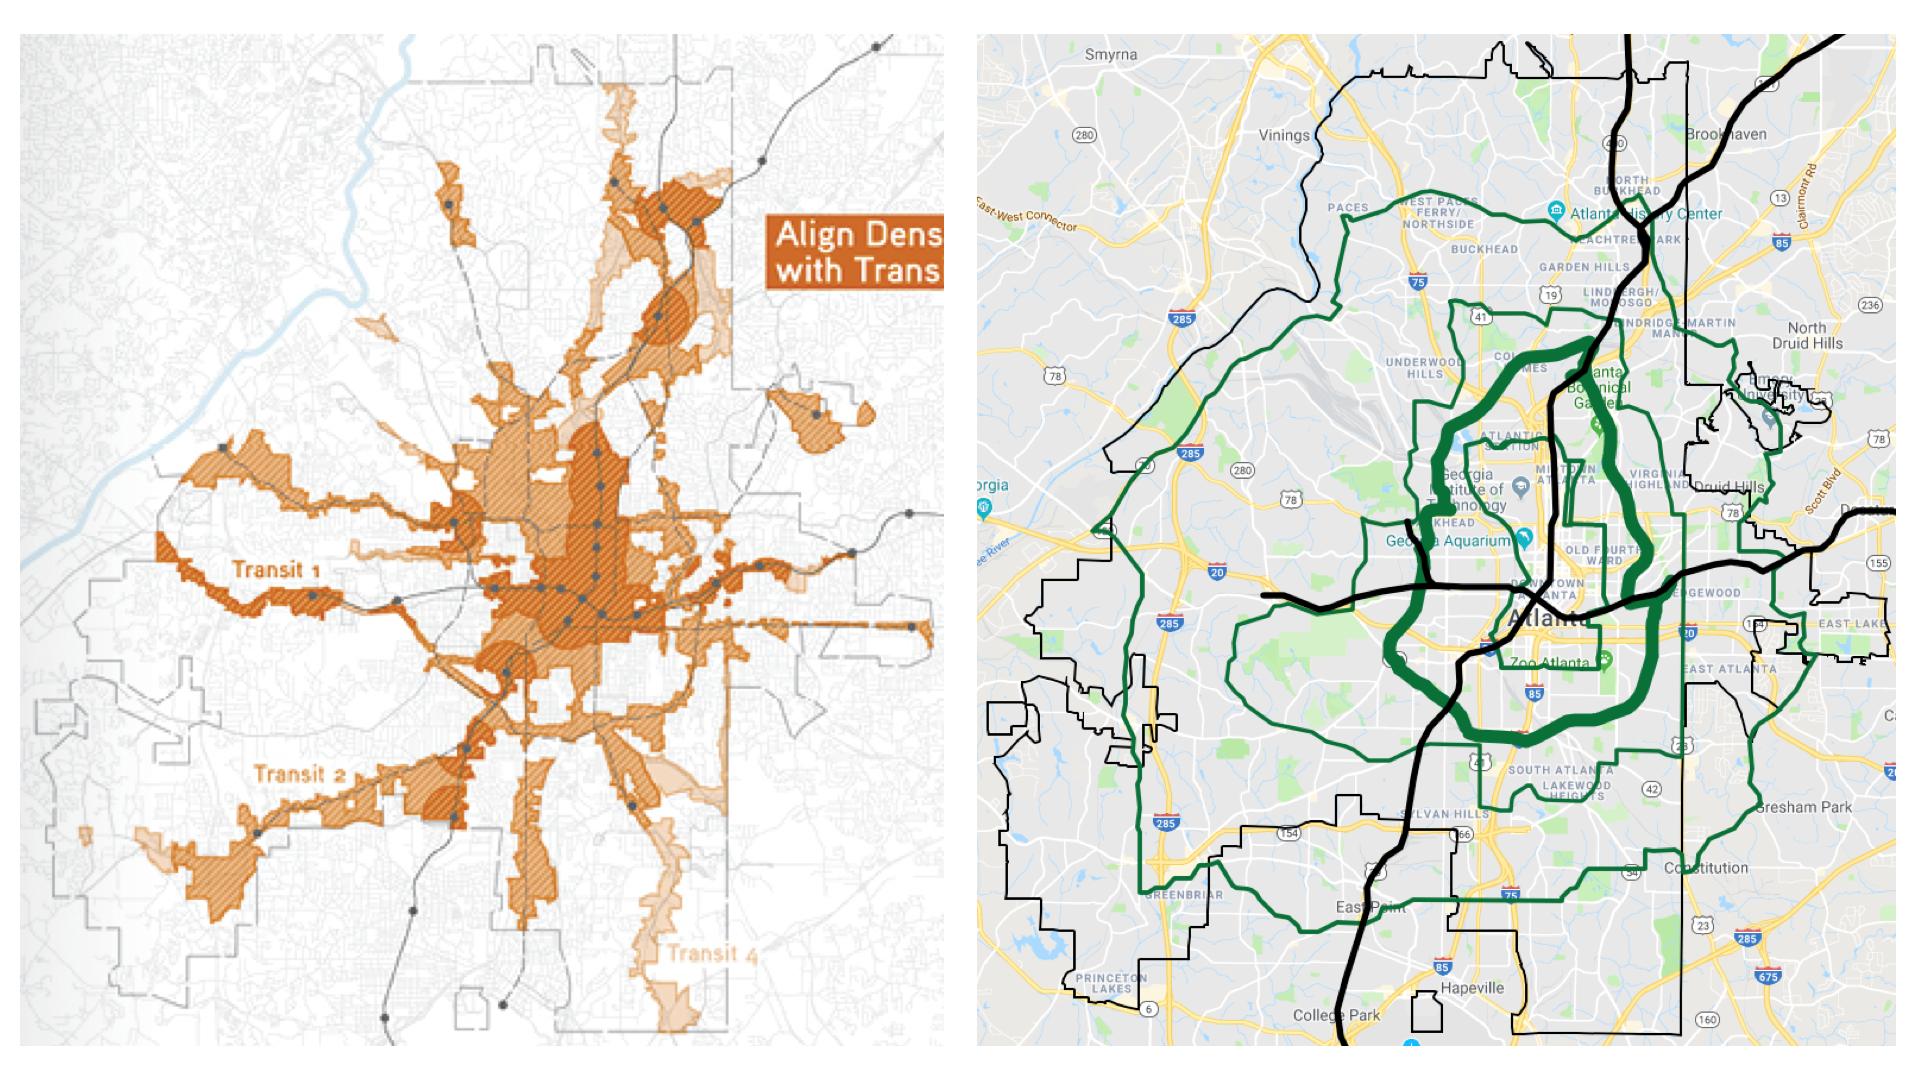 Aligning Transit with Density